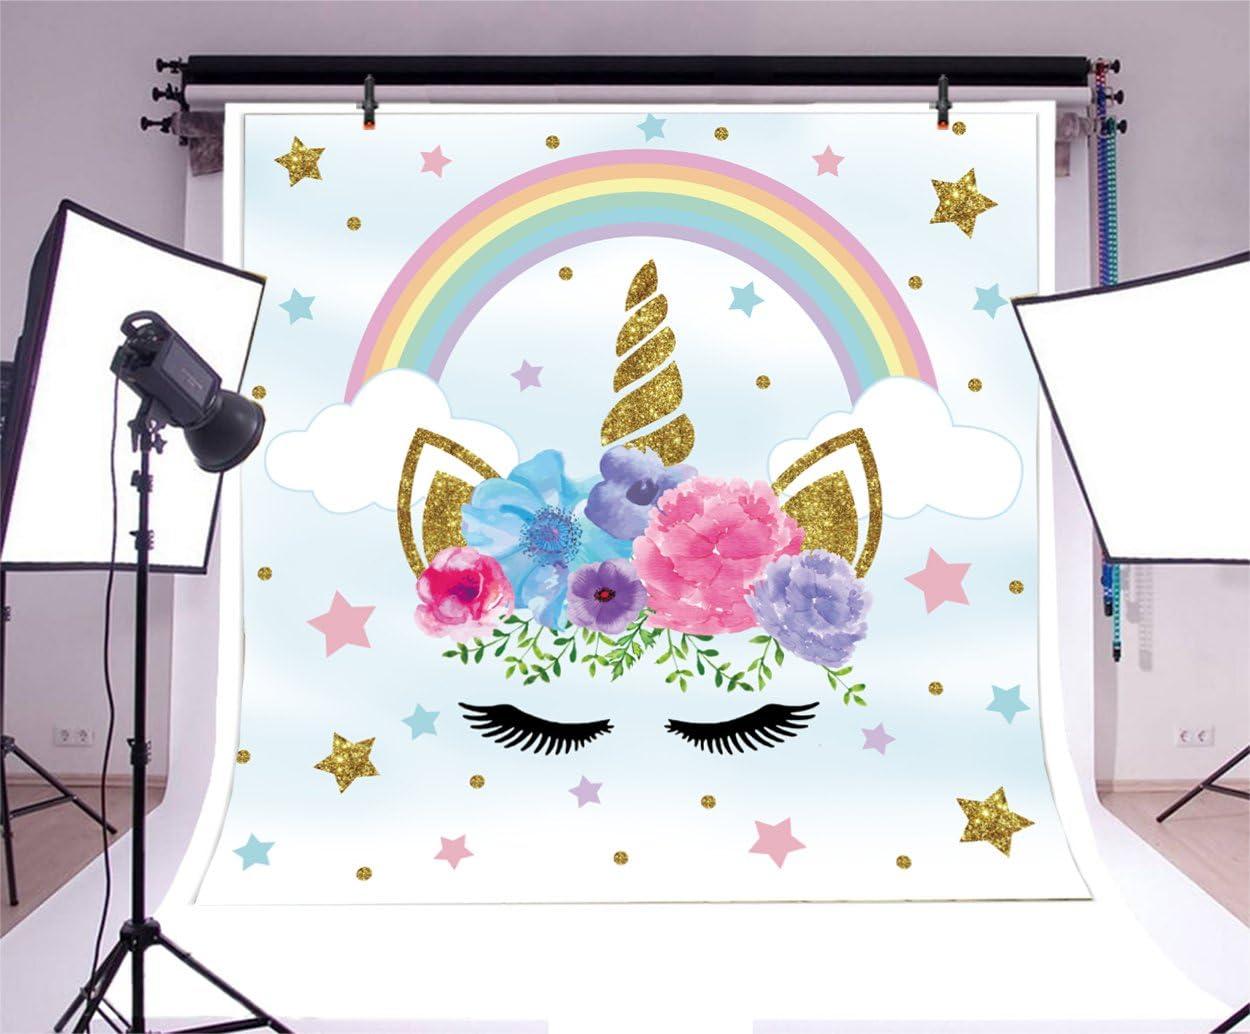 Yeele 10x10ft Birthday Party Banner Backdrop Sweet Flowers Cartoon Unicorn Rainbow Stars Photography Background Baby Shower Infant Newborn Child Girl Artistic Portrait Photo Shoot Studio Props